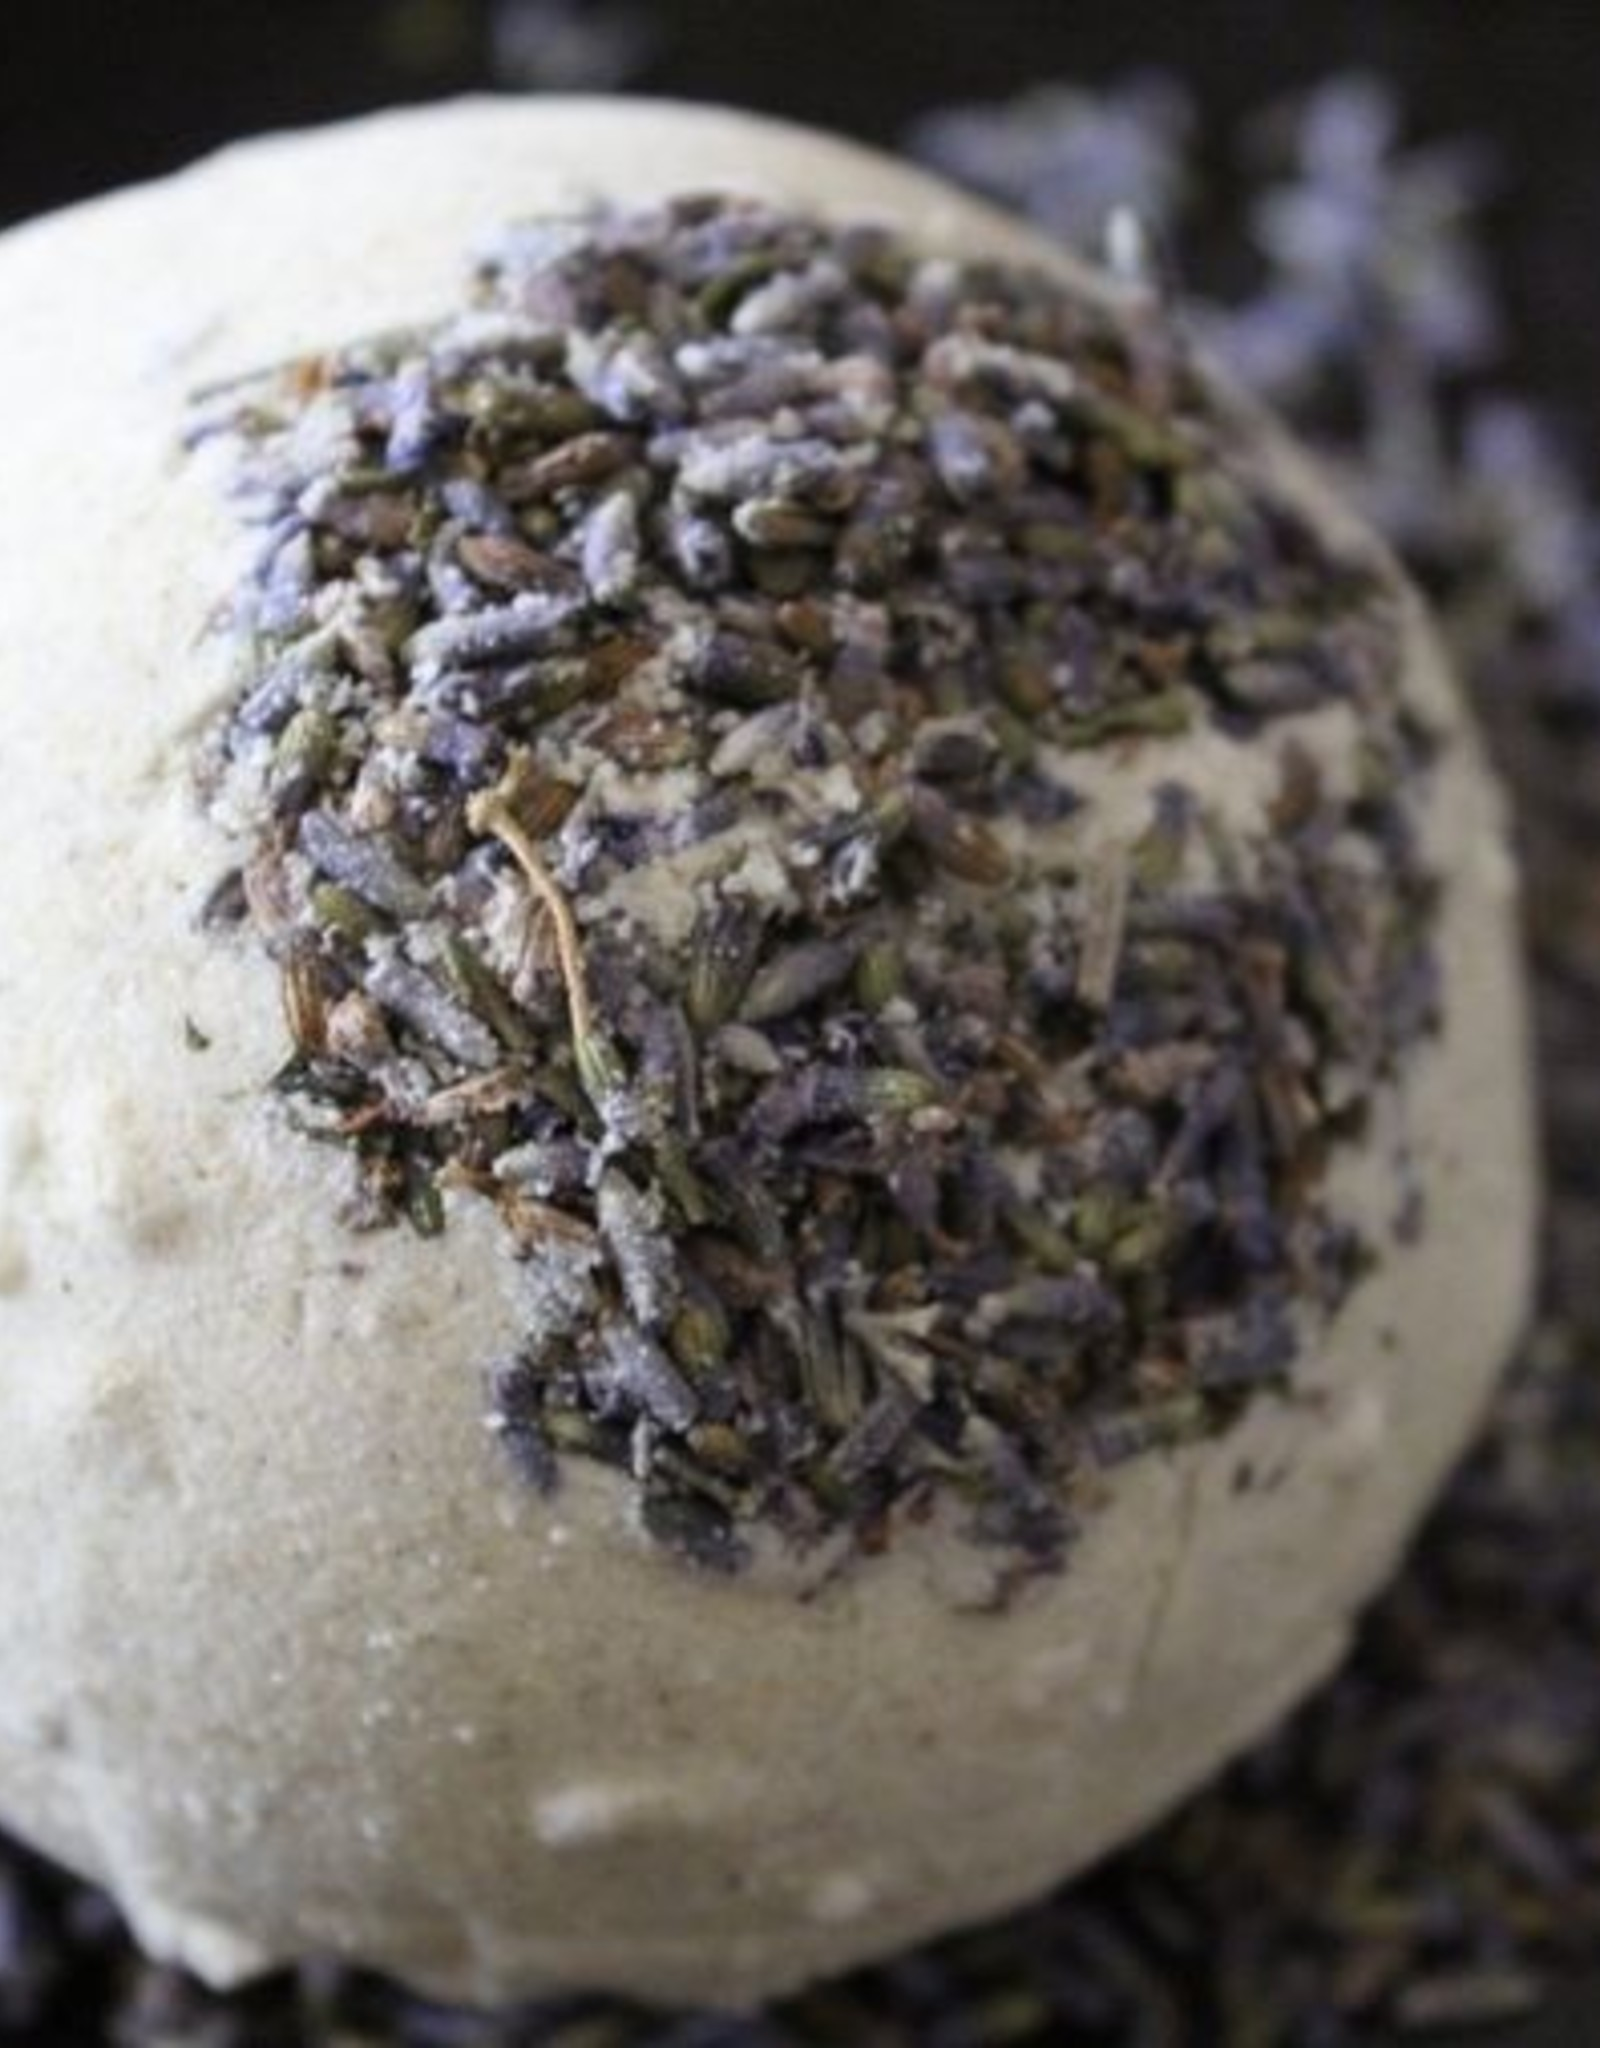 Butter Me Up Organics (DC) Lavender and Chamomile Bath Fizzie